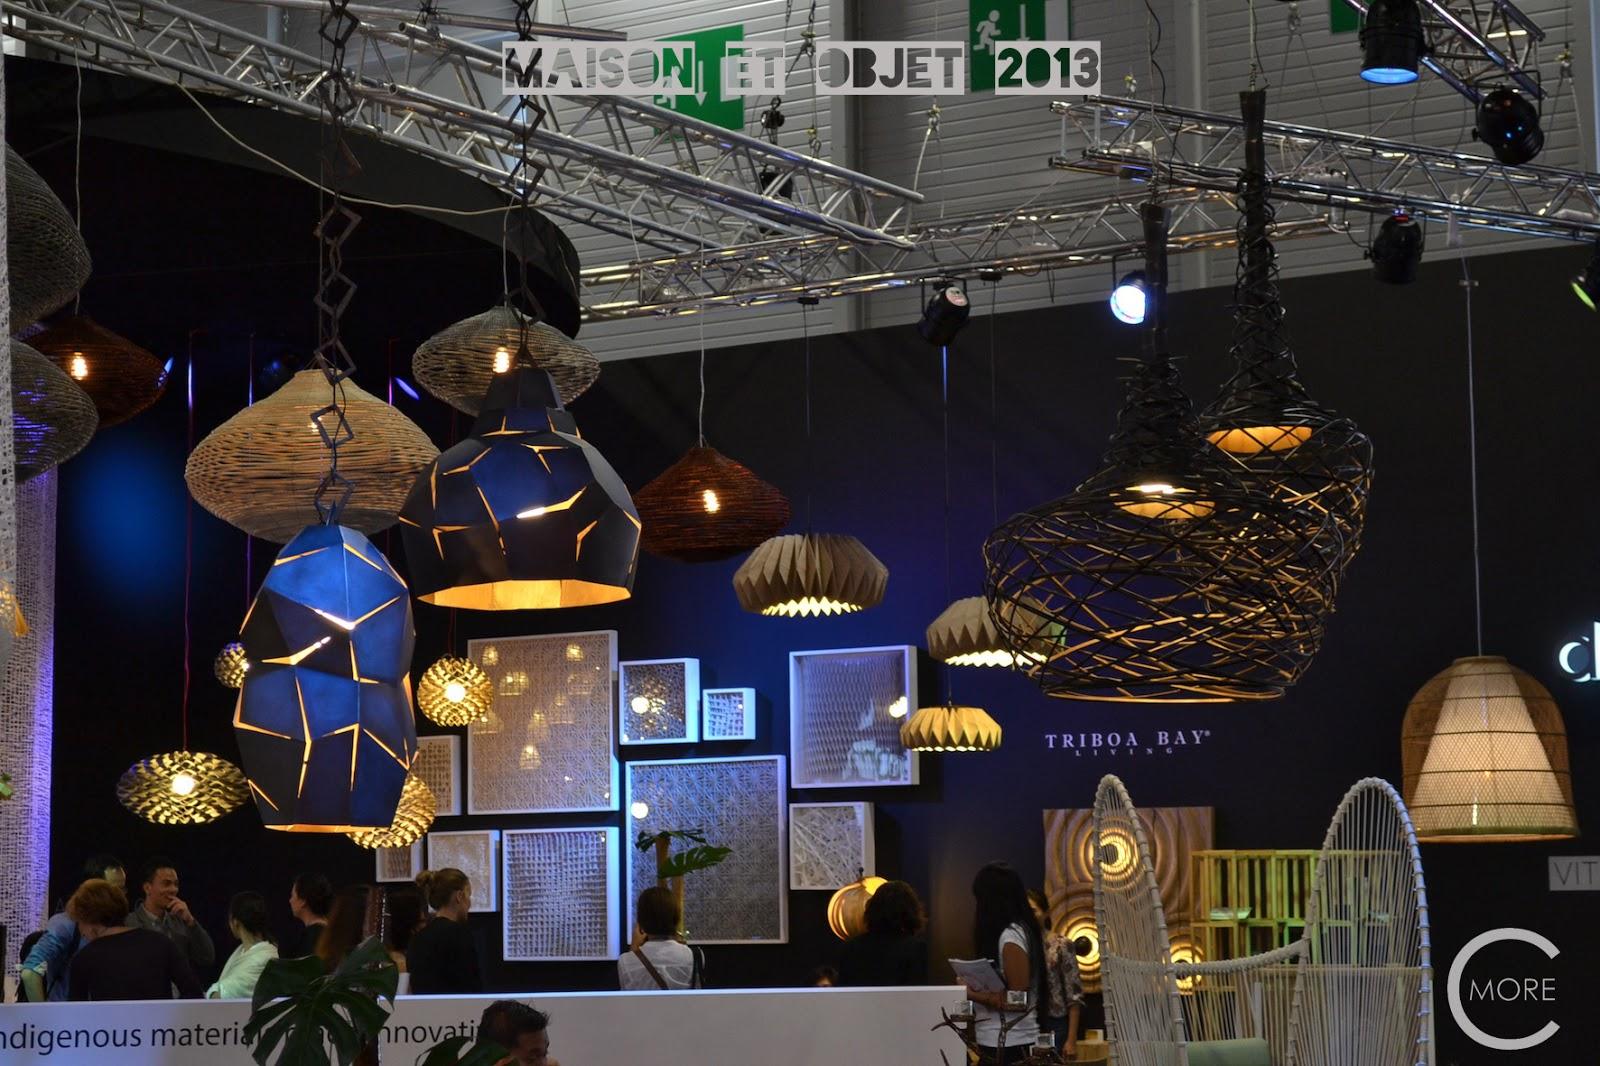 c more interieuradvies blog interior and design blog highlights maison et objet 2013 by c more. Black Bedroom Furniture Sets. Home Design Ideas